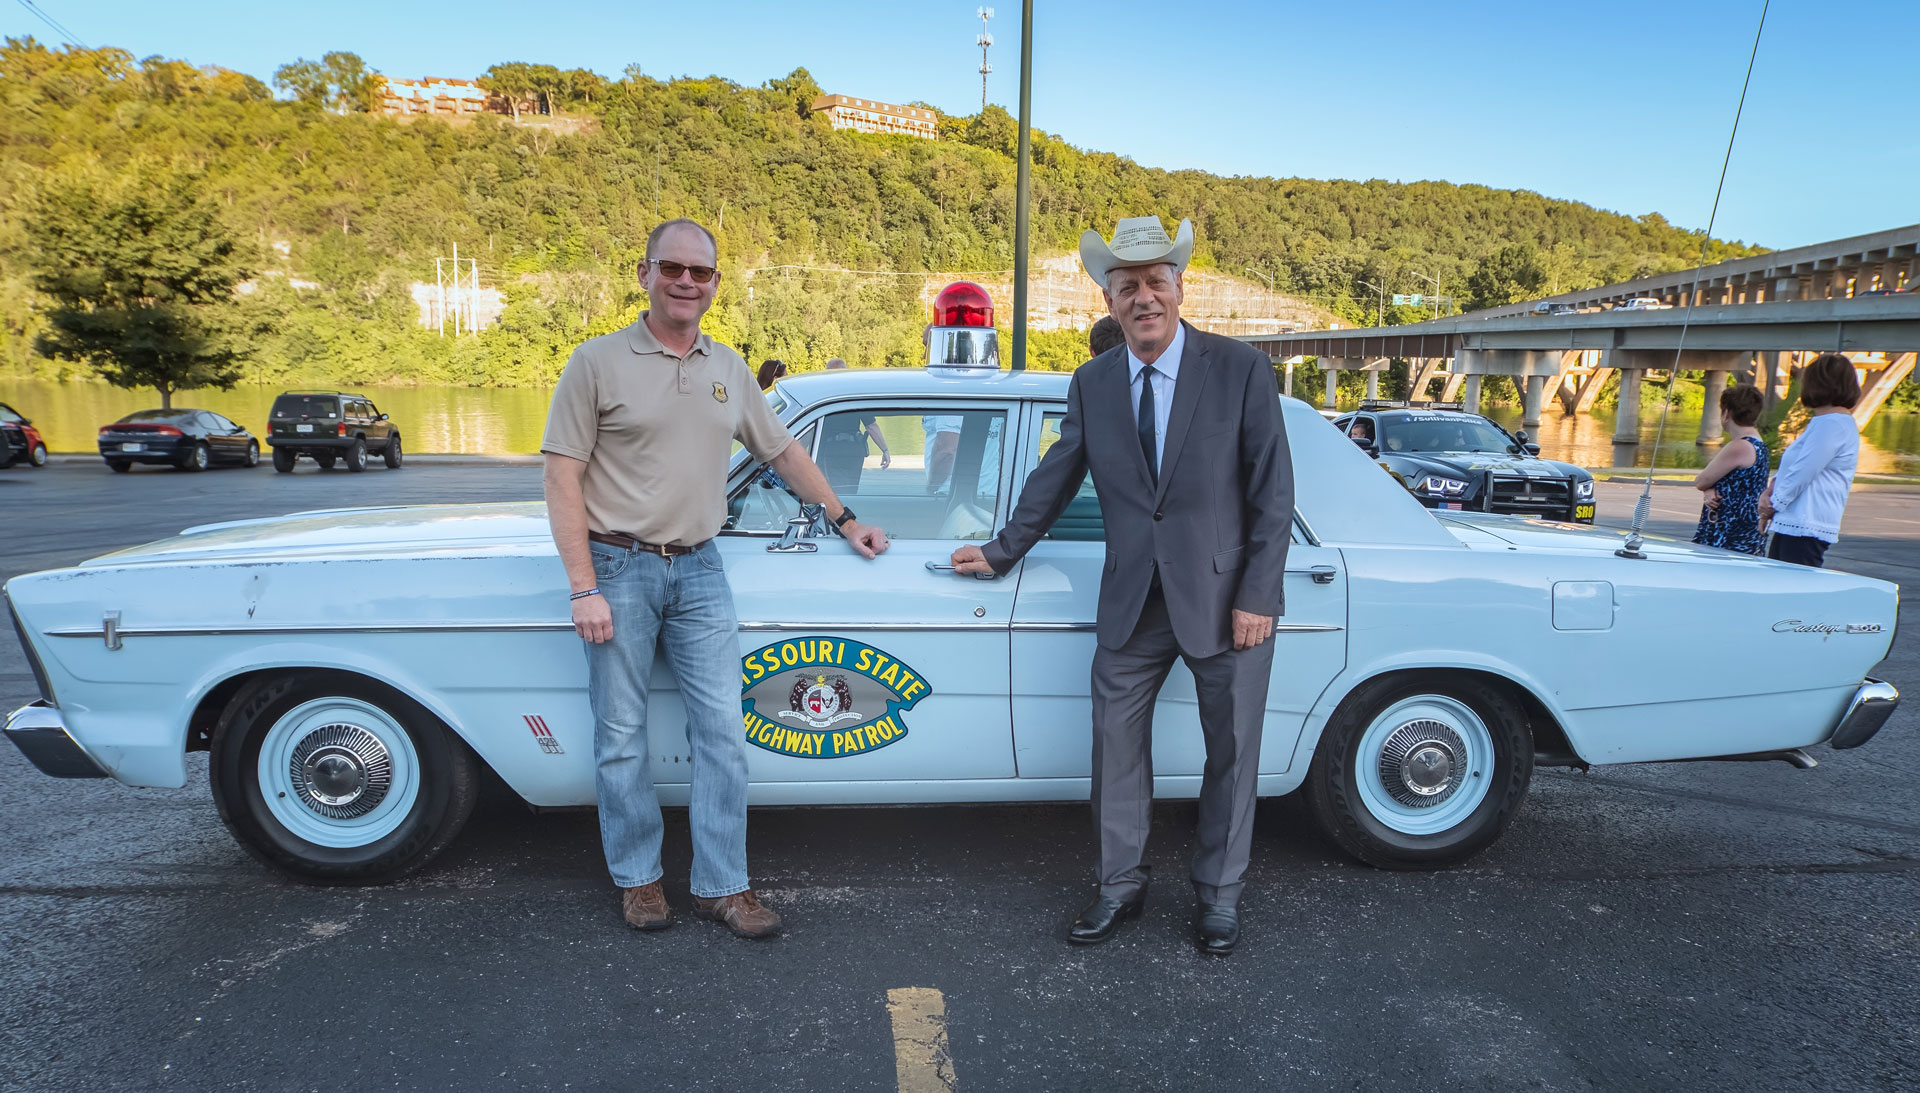 Classic Missouri State Highway Patrol Car